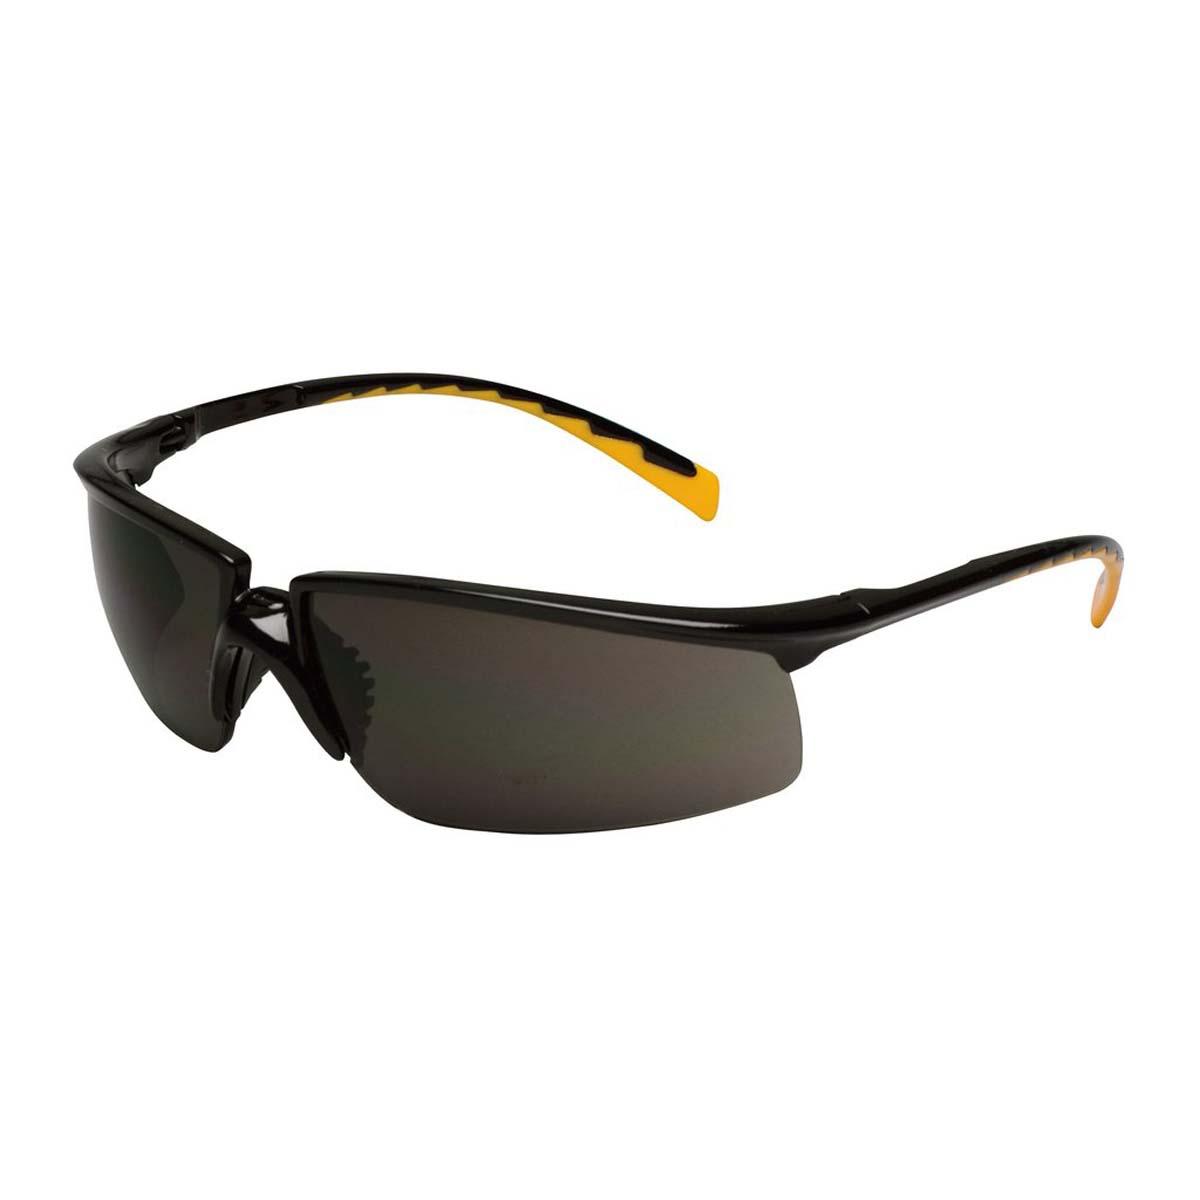 "3Mâ""¢ Privoâ""¢ Protective Eyewear 12262-00000-20 Black Frame, Orange Accent Temple Tips, Gray Anti-Fog Lens,"